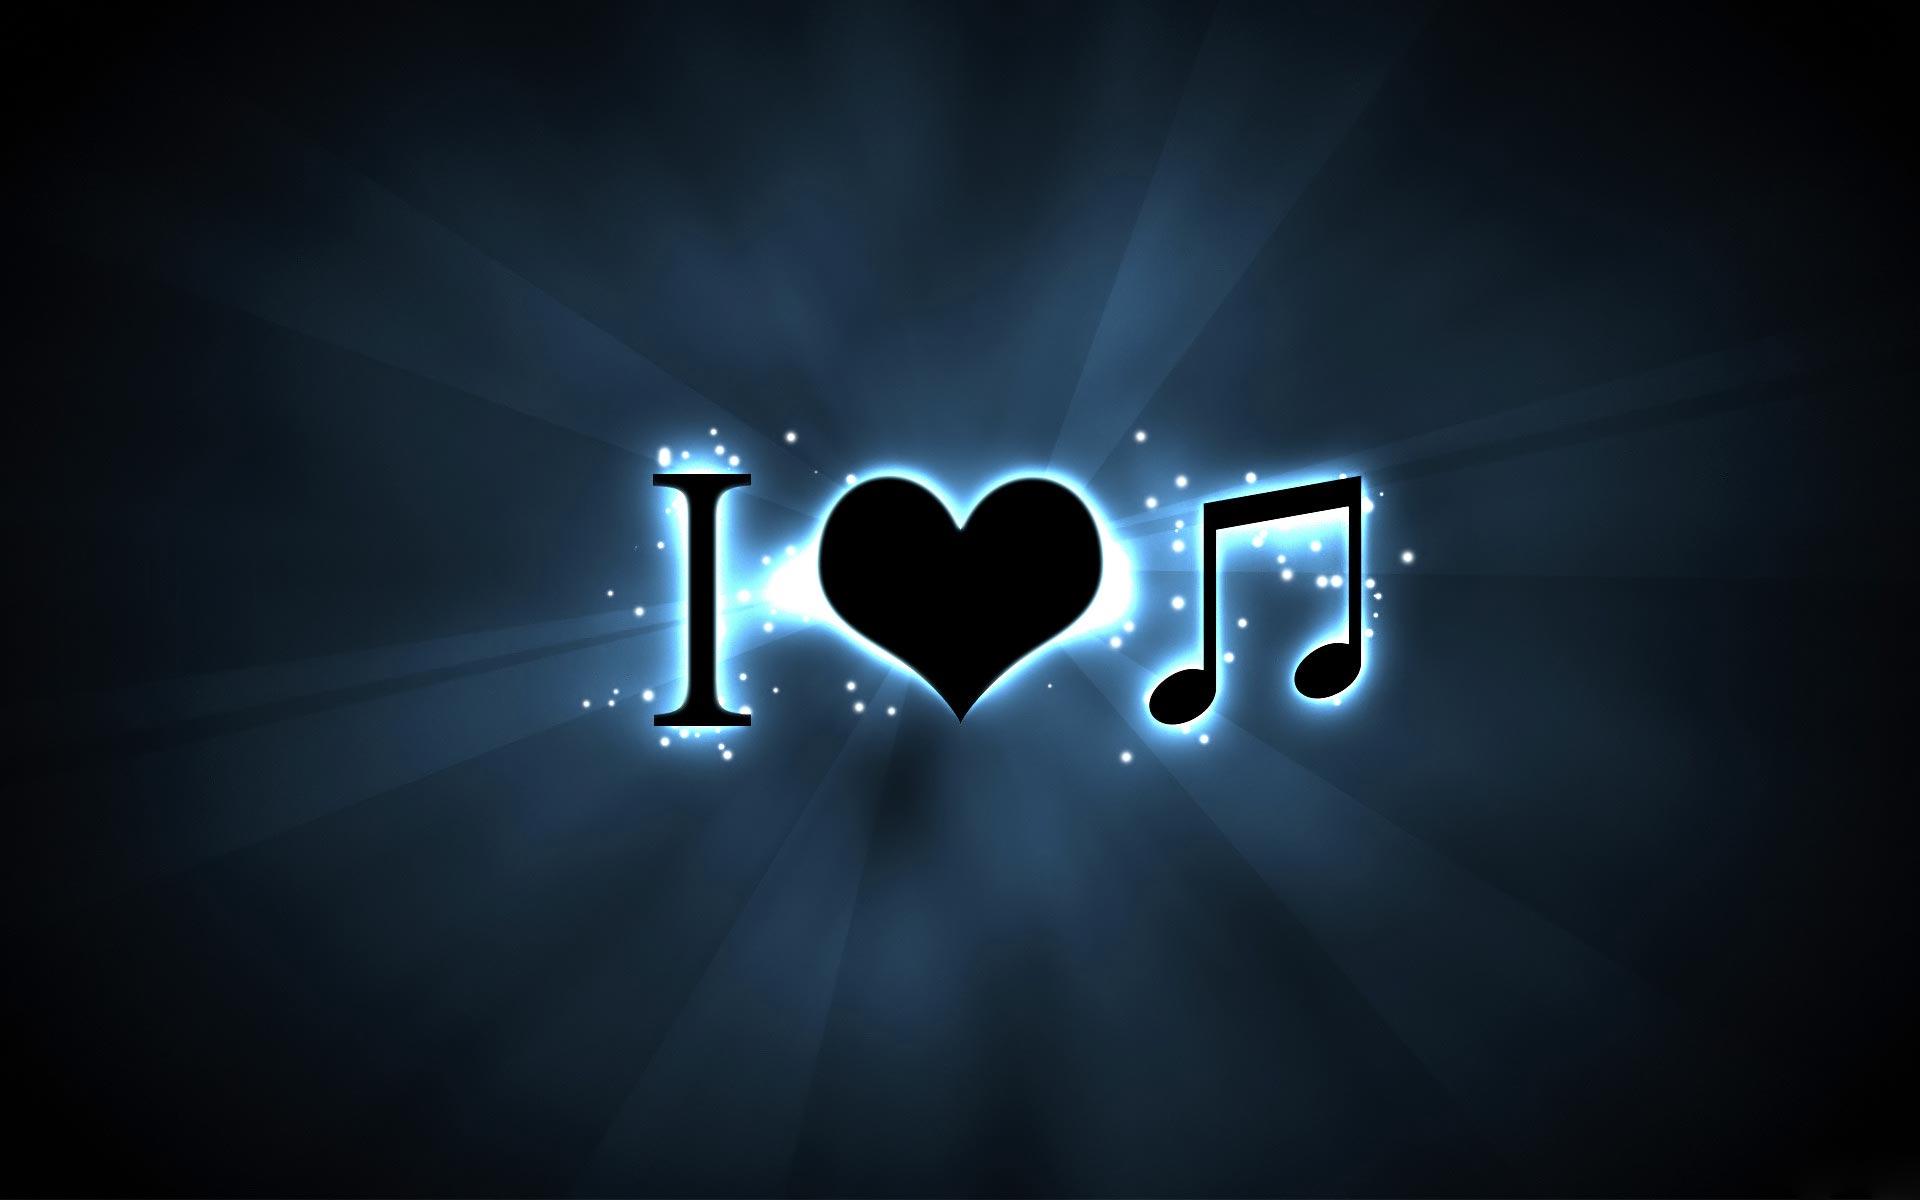 Love Music HD Wallpaper for Desktop and iPad 1920x1200